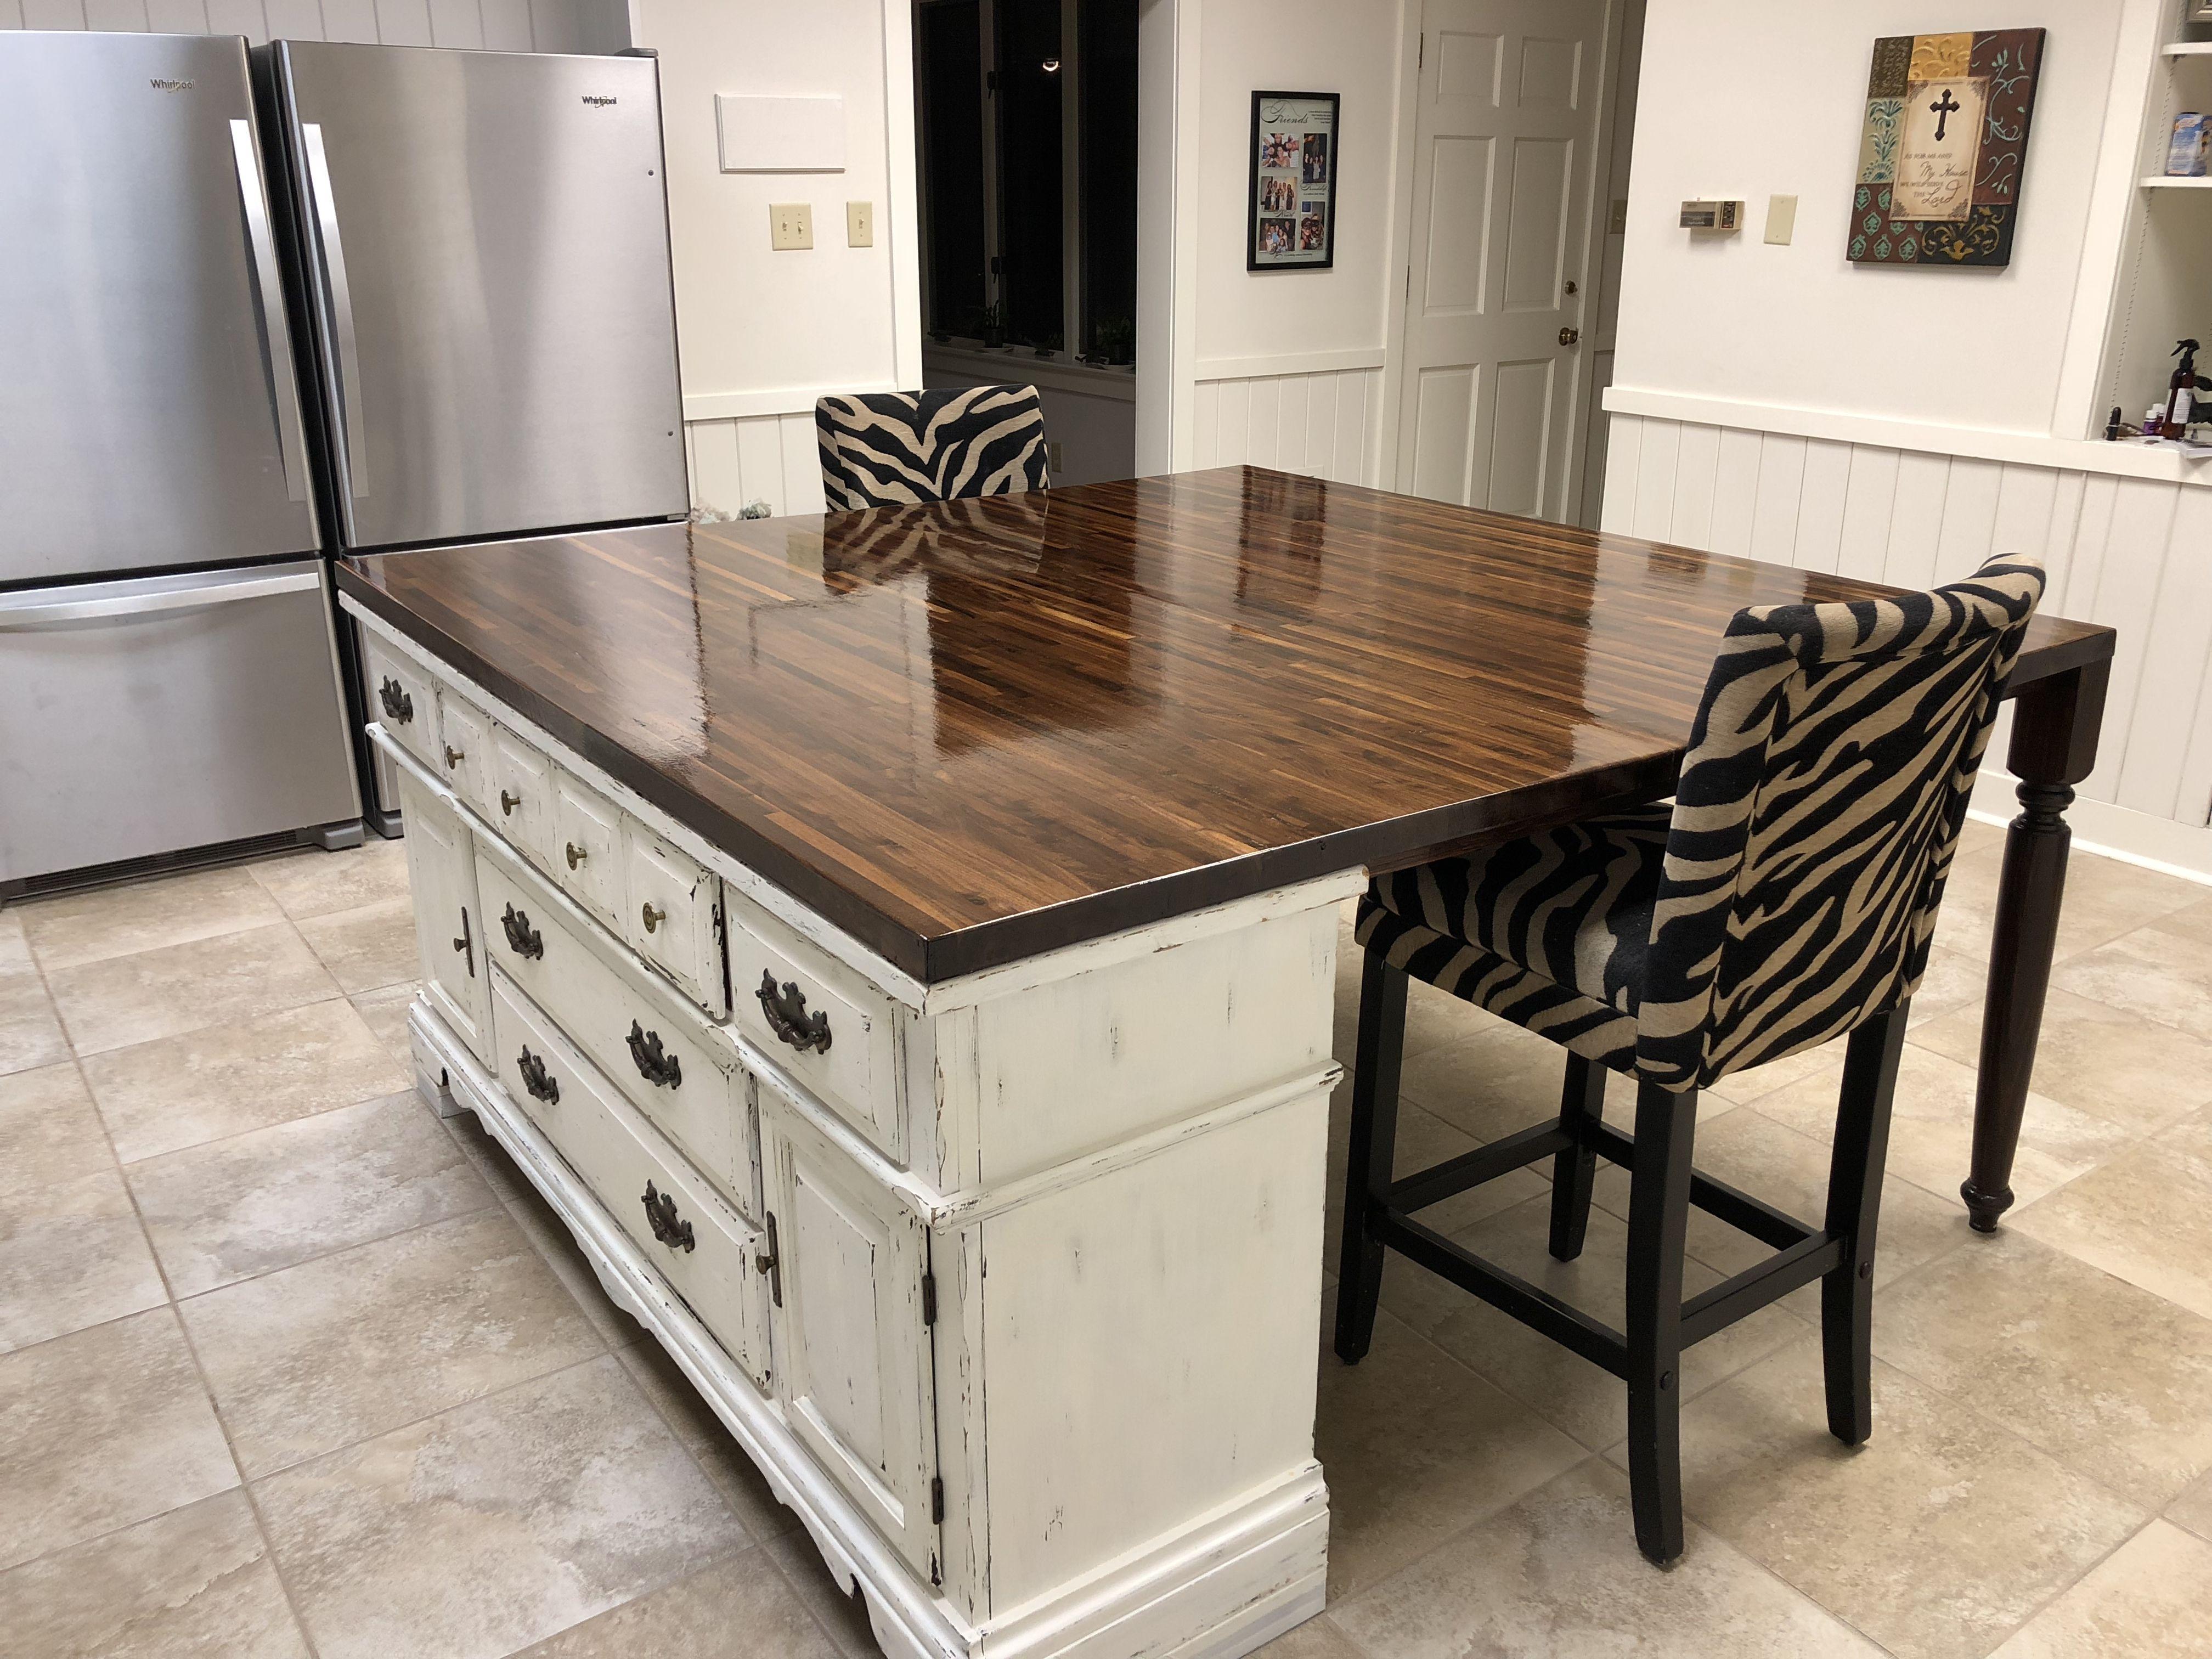 Old Dresser Turned Into Kitchen Island Kuchen Design Kucheninsel Kuchendesign